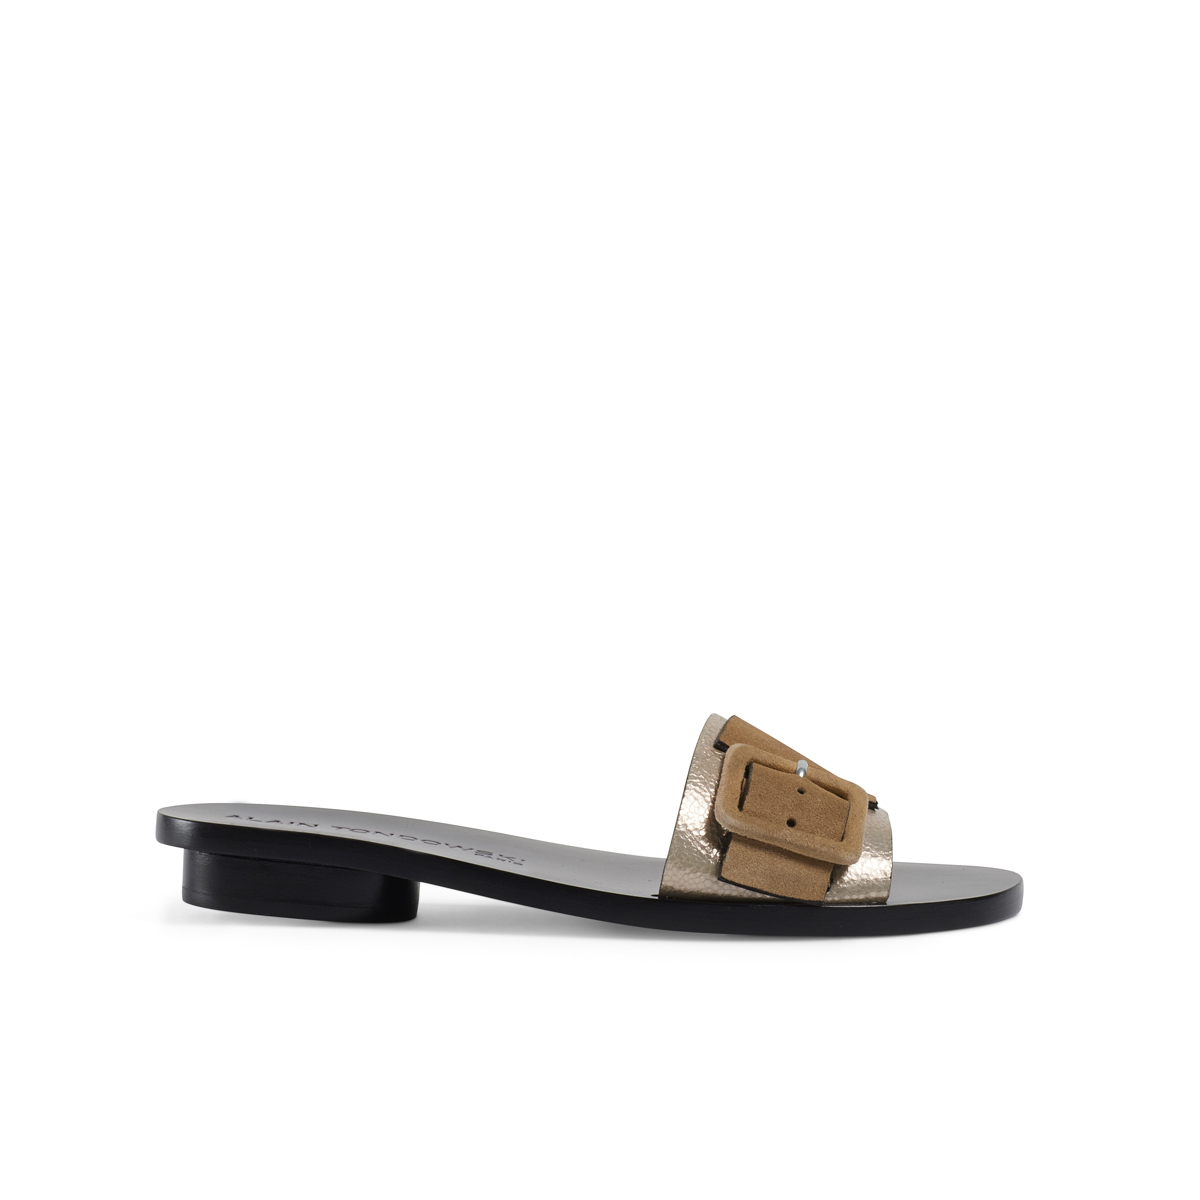 038_alaintondowski_springsummer2017_shoes_3014